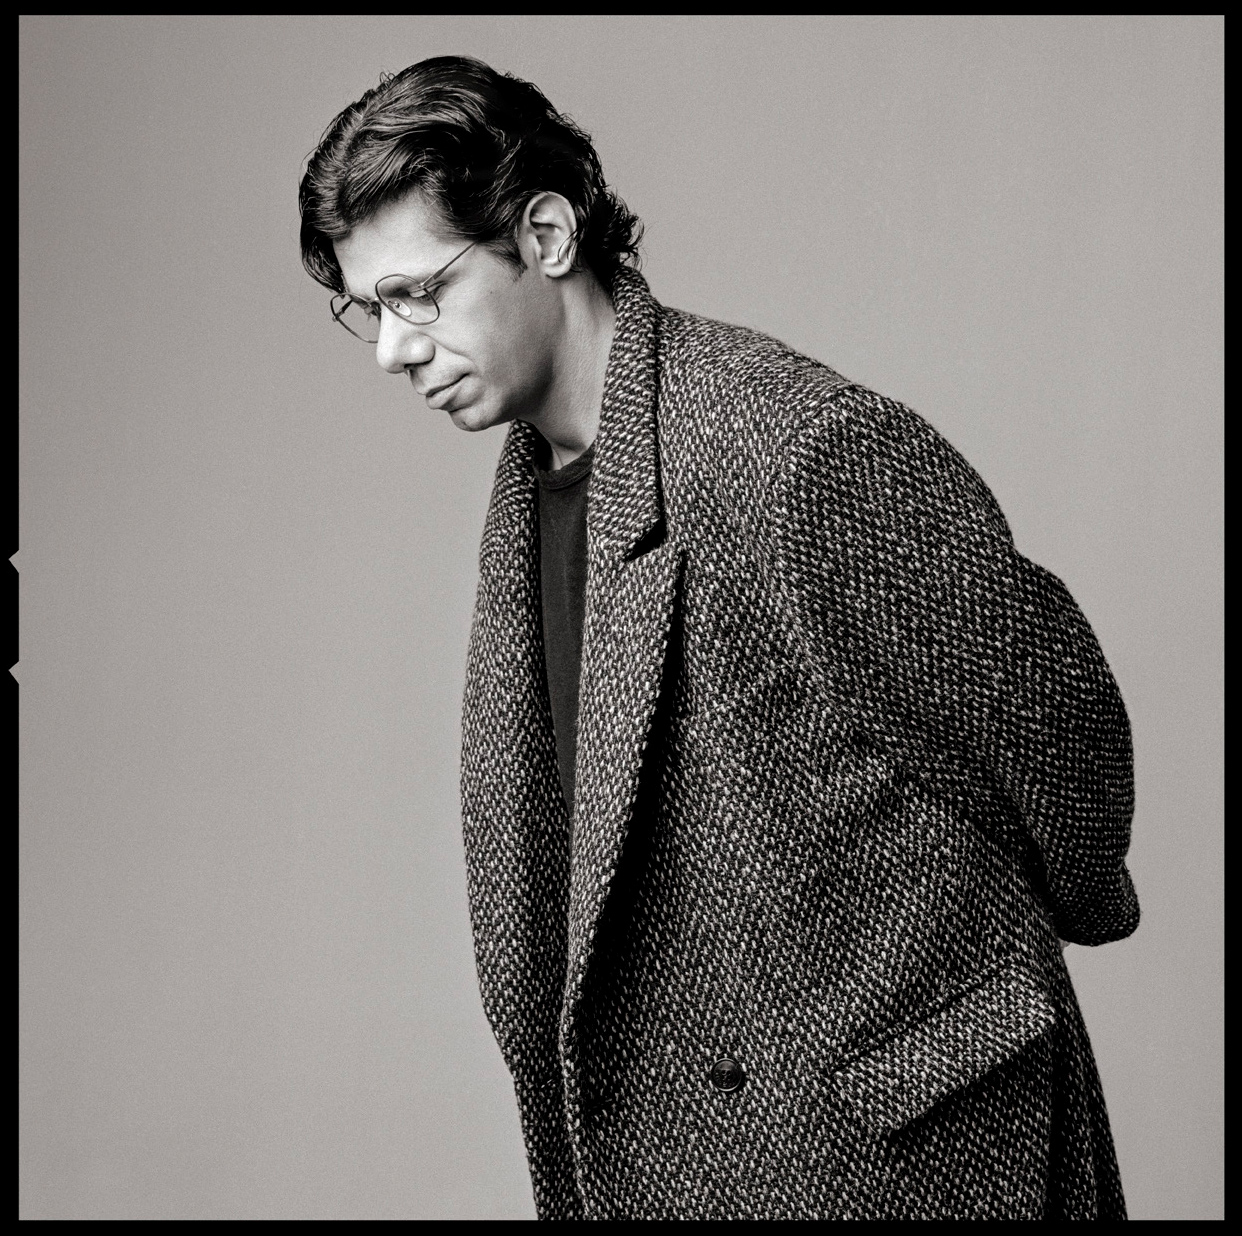 80s Portrait Sessions Images_Page_24.jpg